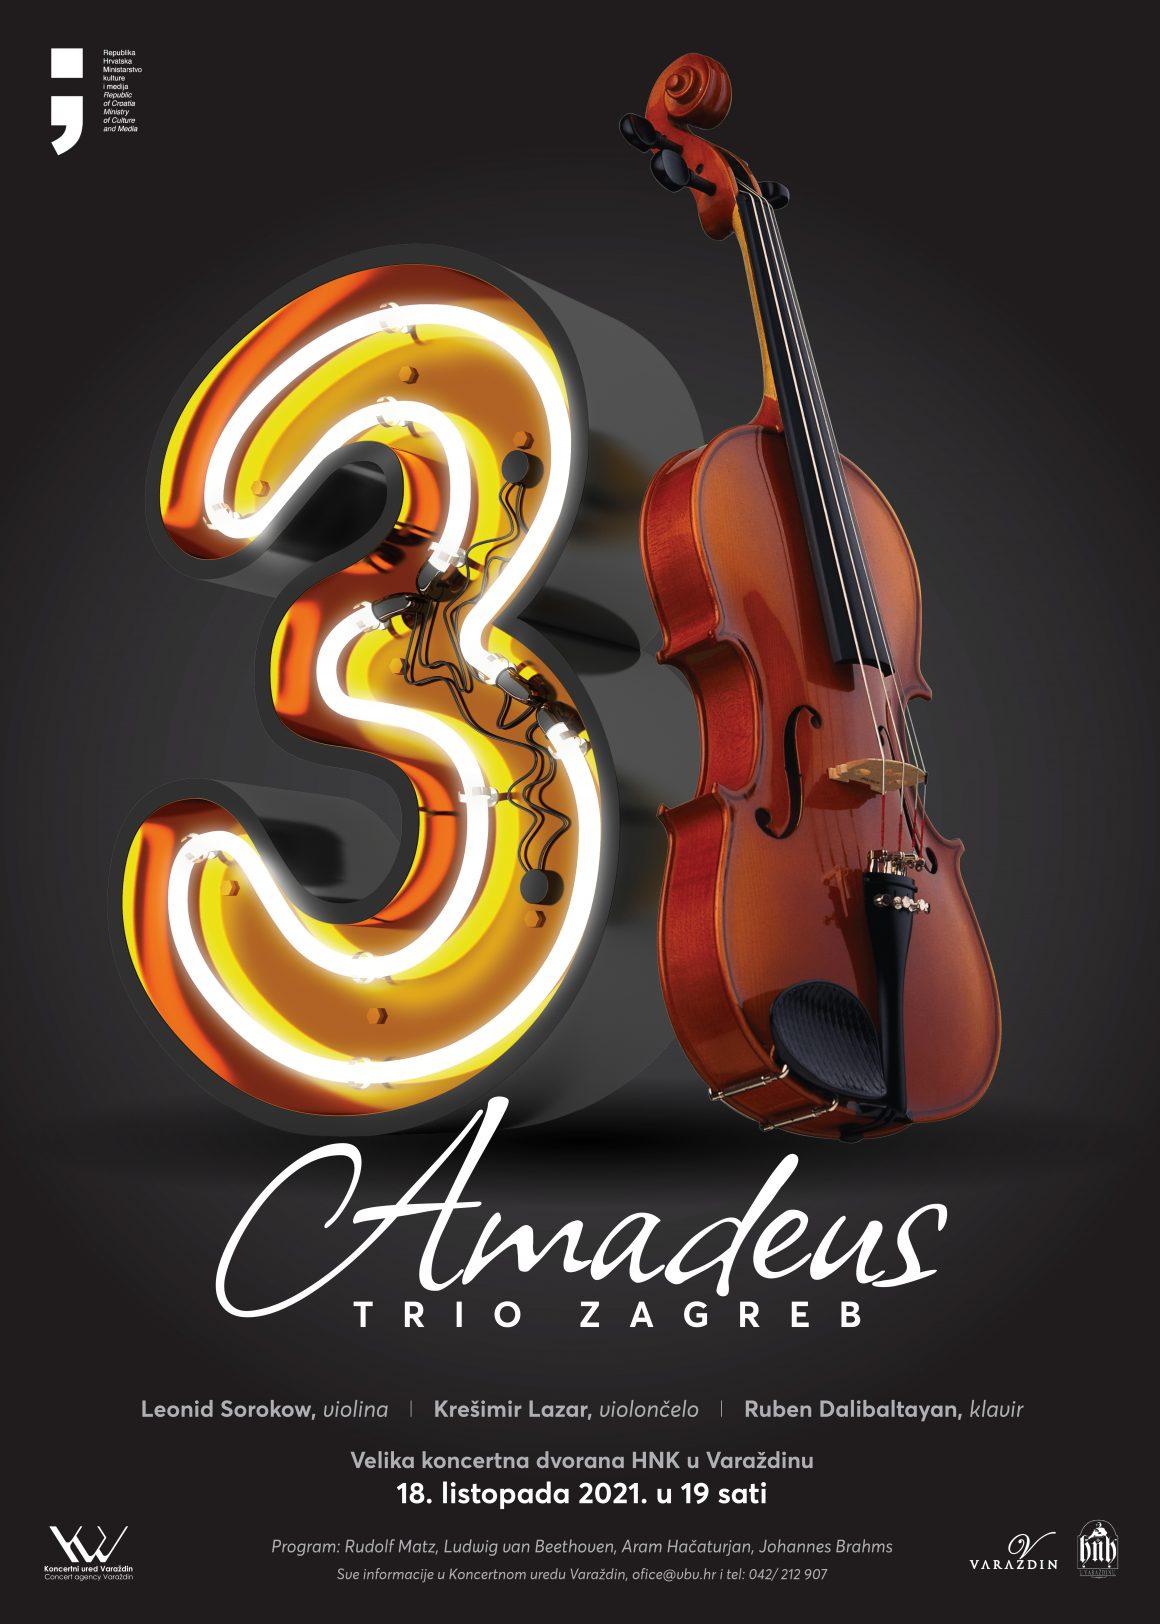 Amadeus trio Zagreb